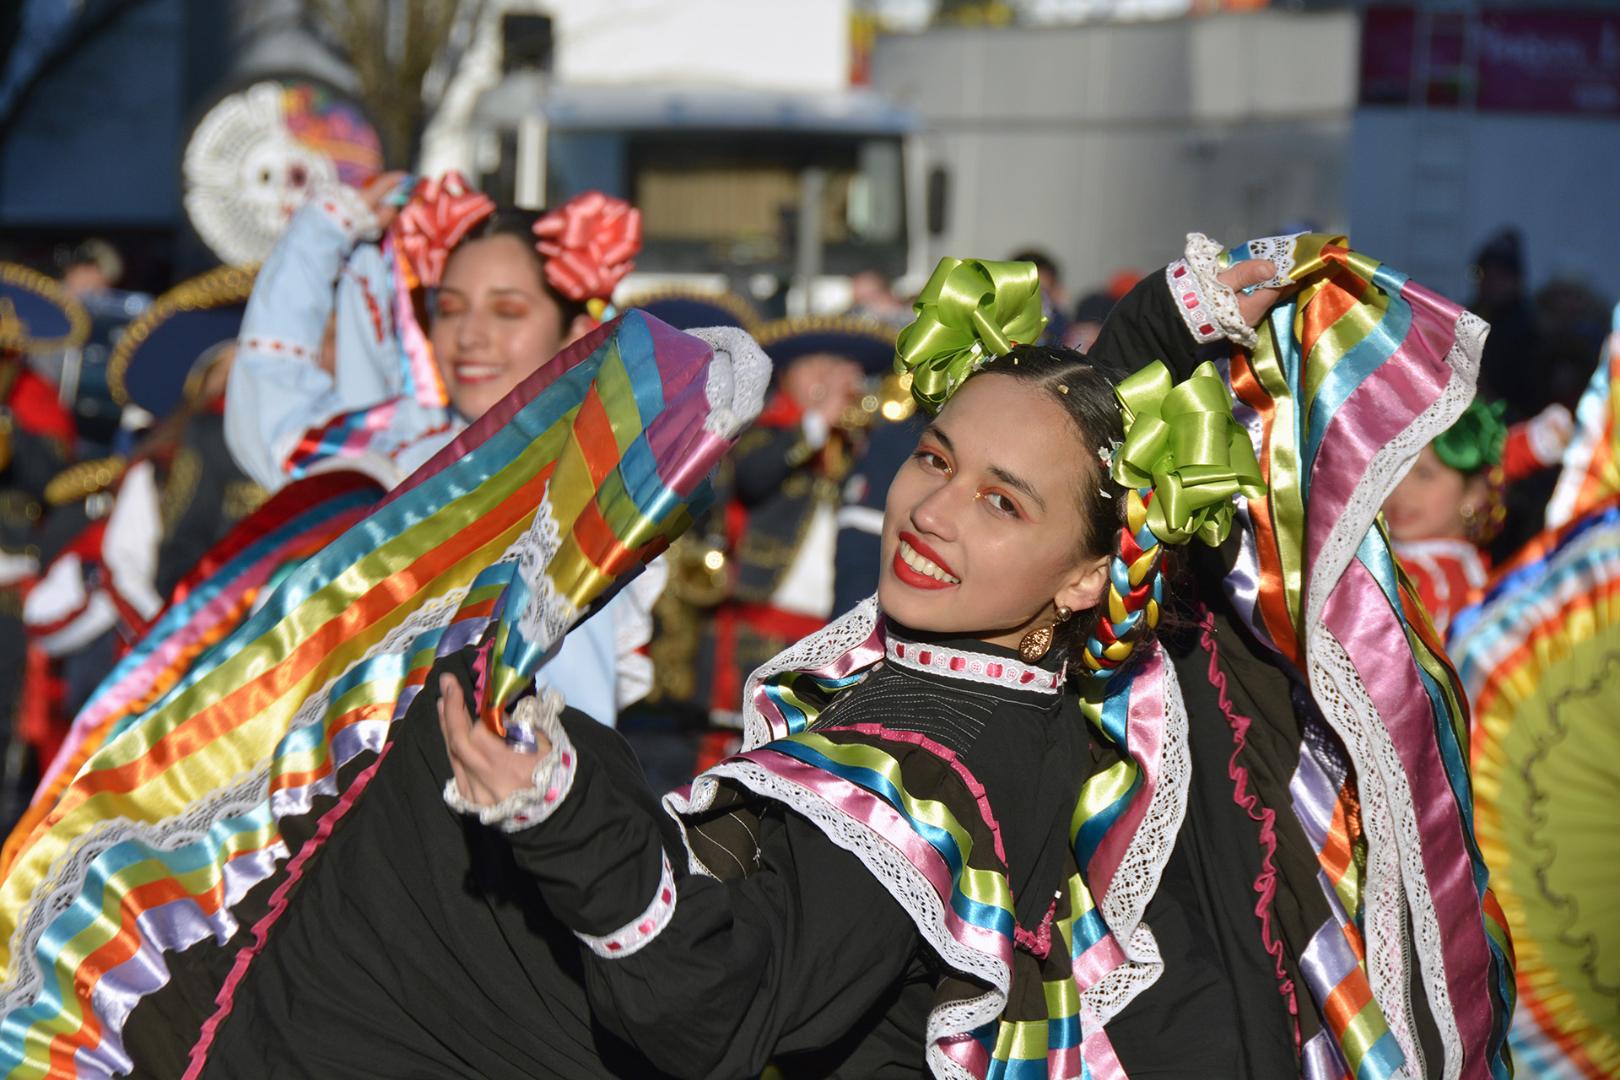 carnaval2019-15 (2021_02_07 10_18_26 UTC)